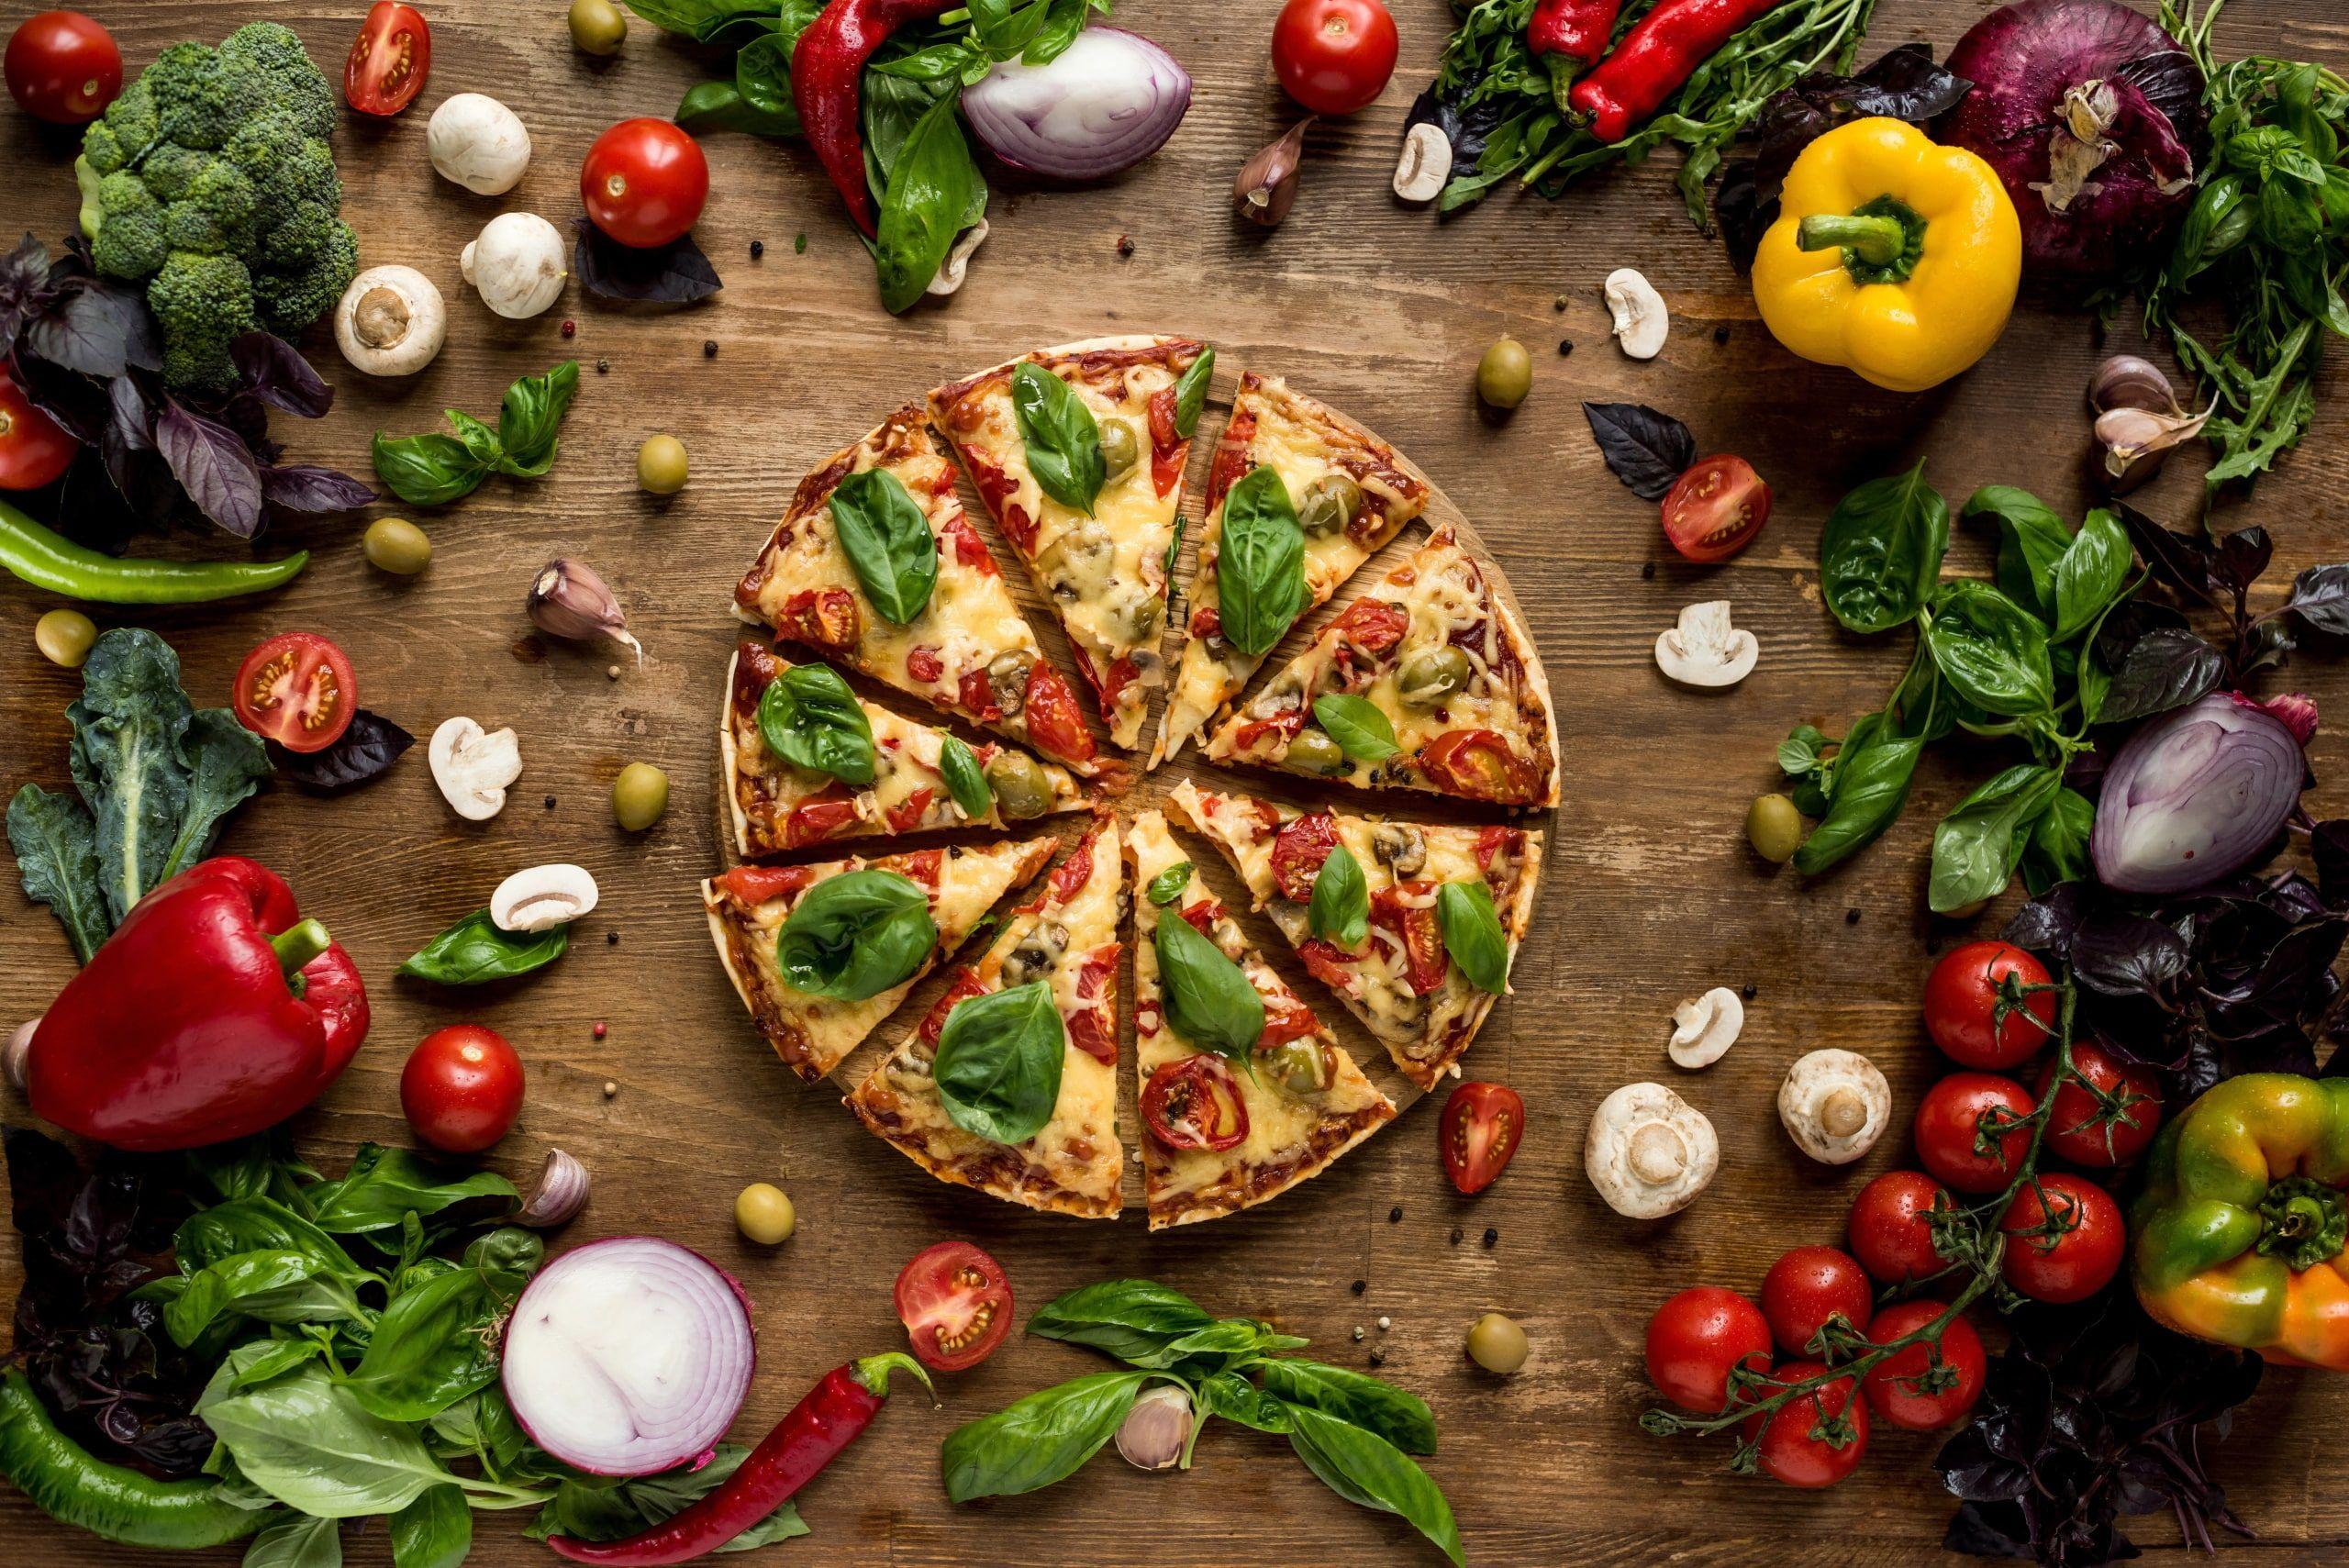 Pizza Food Vegetables Fruit 2k Wallpaper Hdwallpaper Desktop Pizza Day Healthy Eating Food Combining